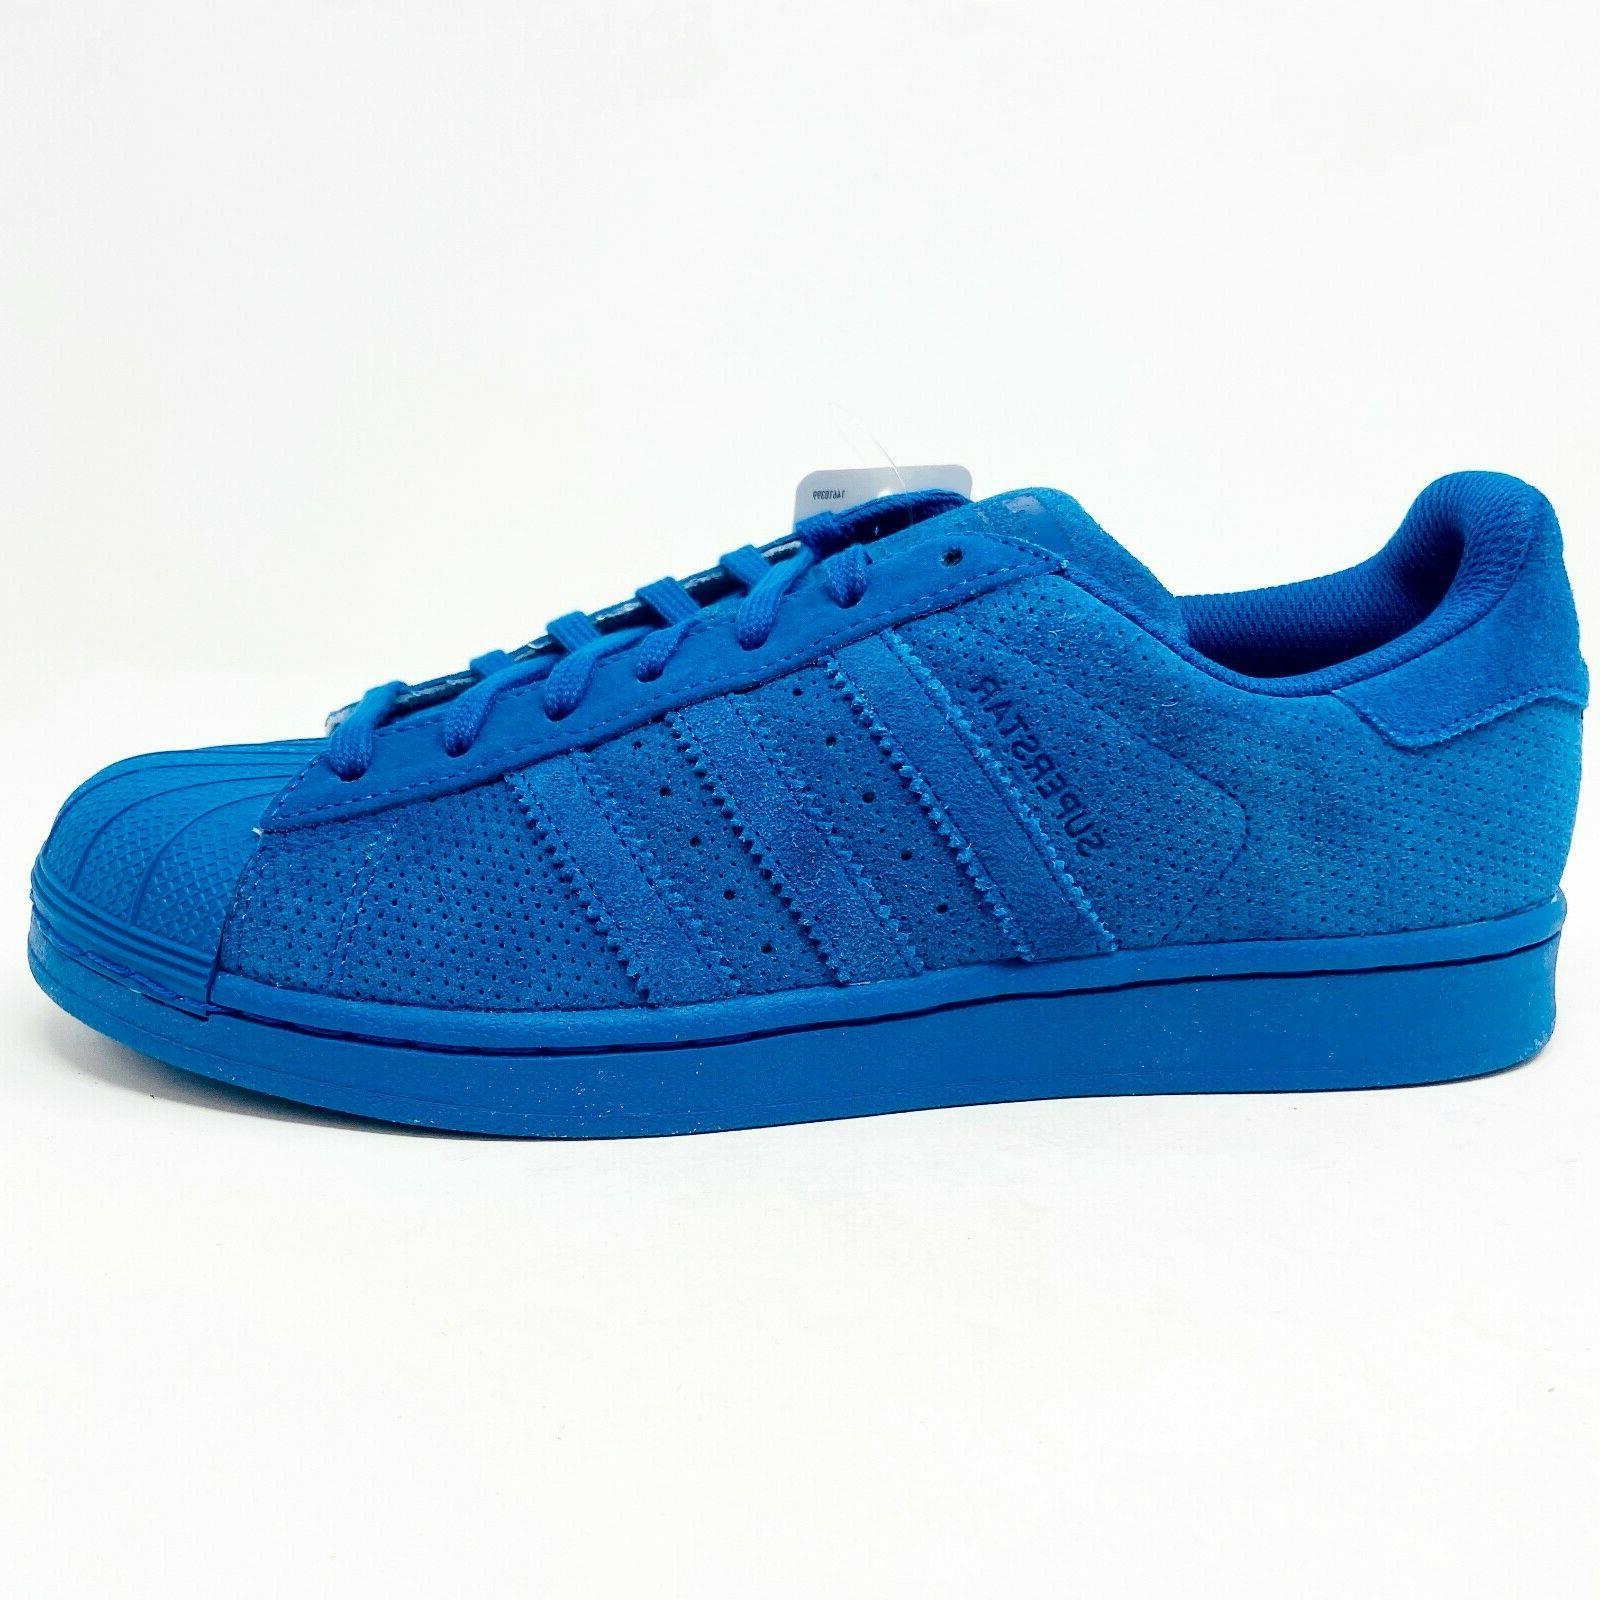 Adidas Superstar Mono Mens Shell Toe